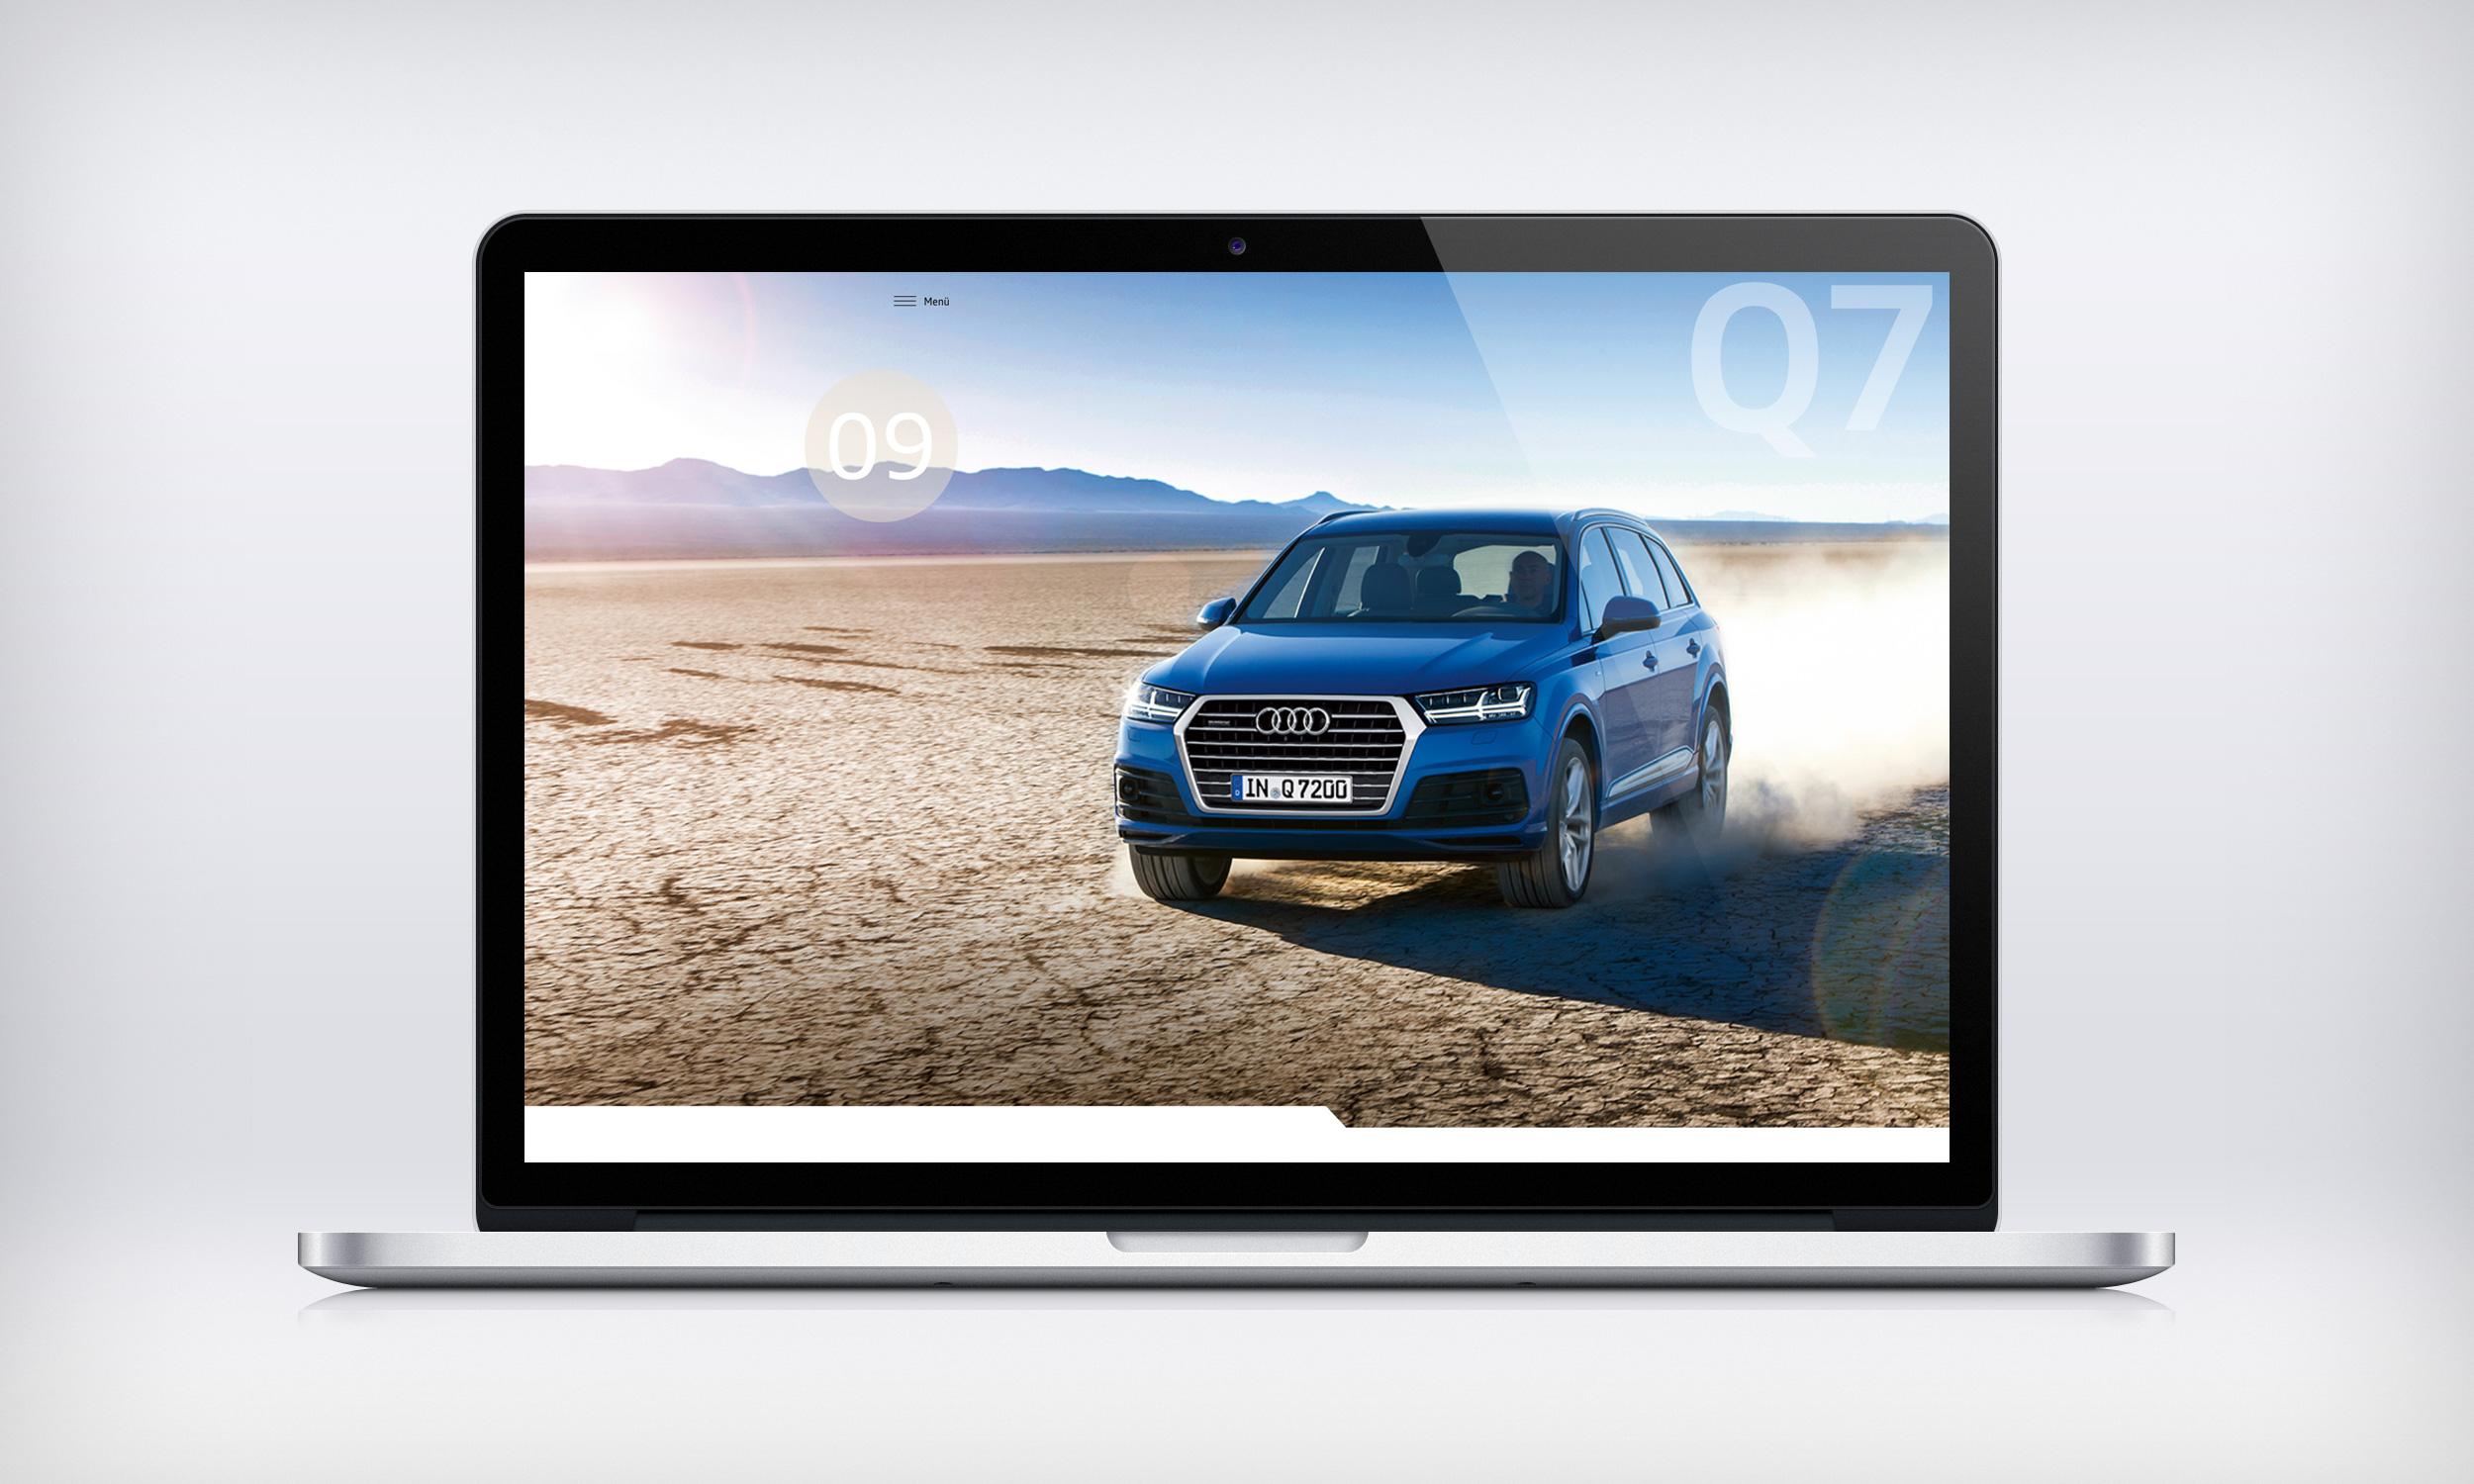 MacBook-Pro-mockup_04.jpg